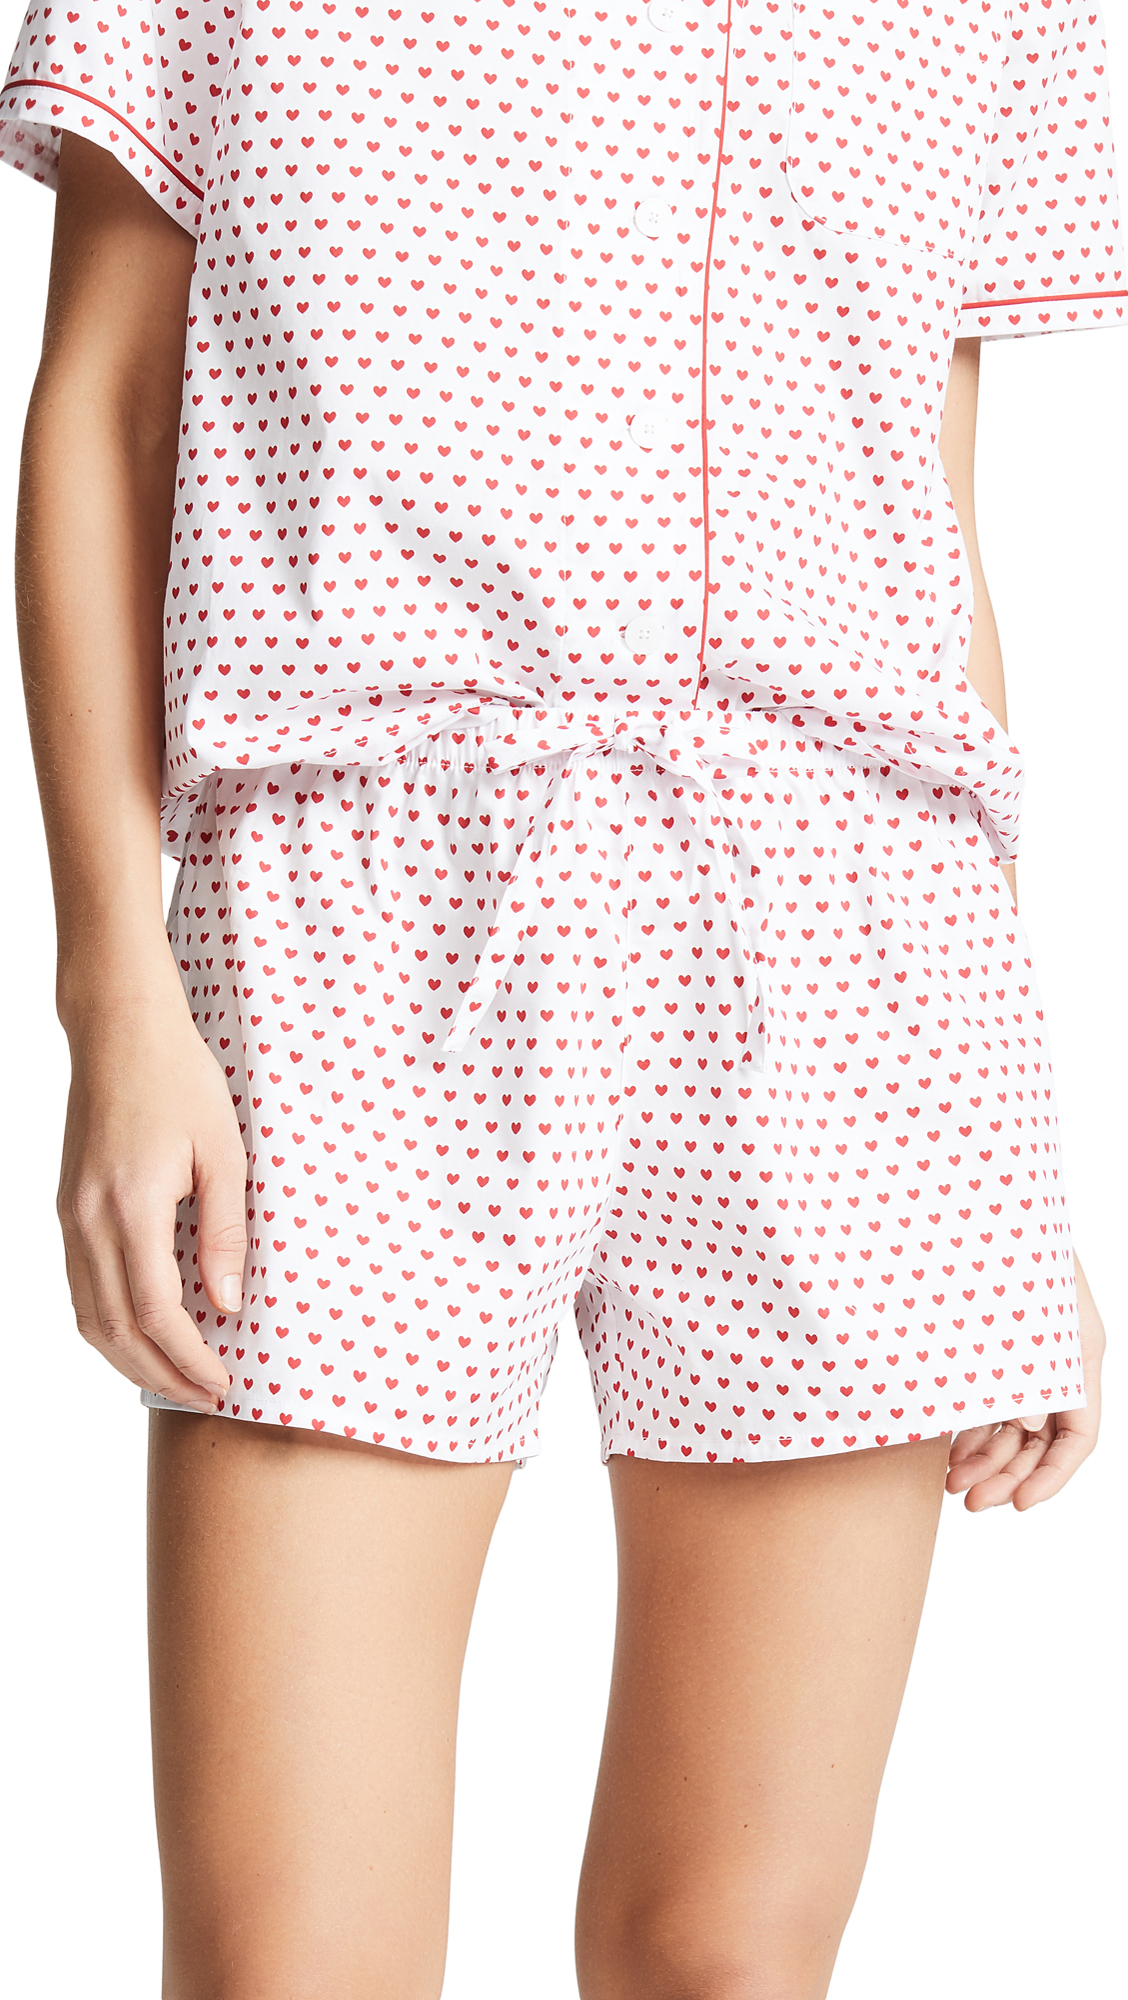 SLEEPY JONES Paloma Pajama Shorts in White/Red